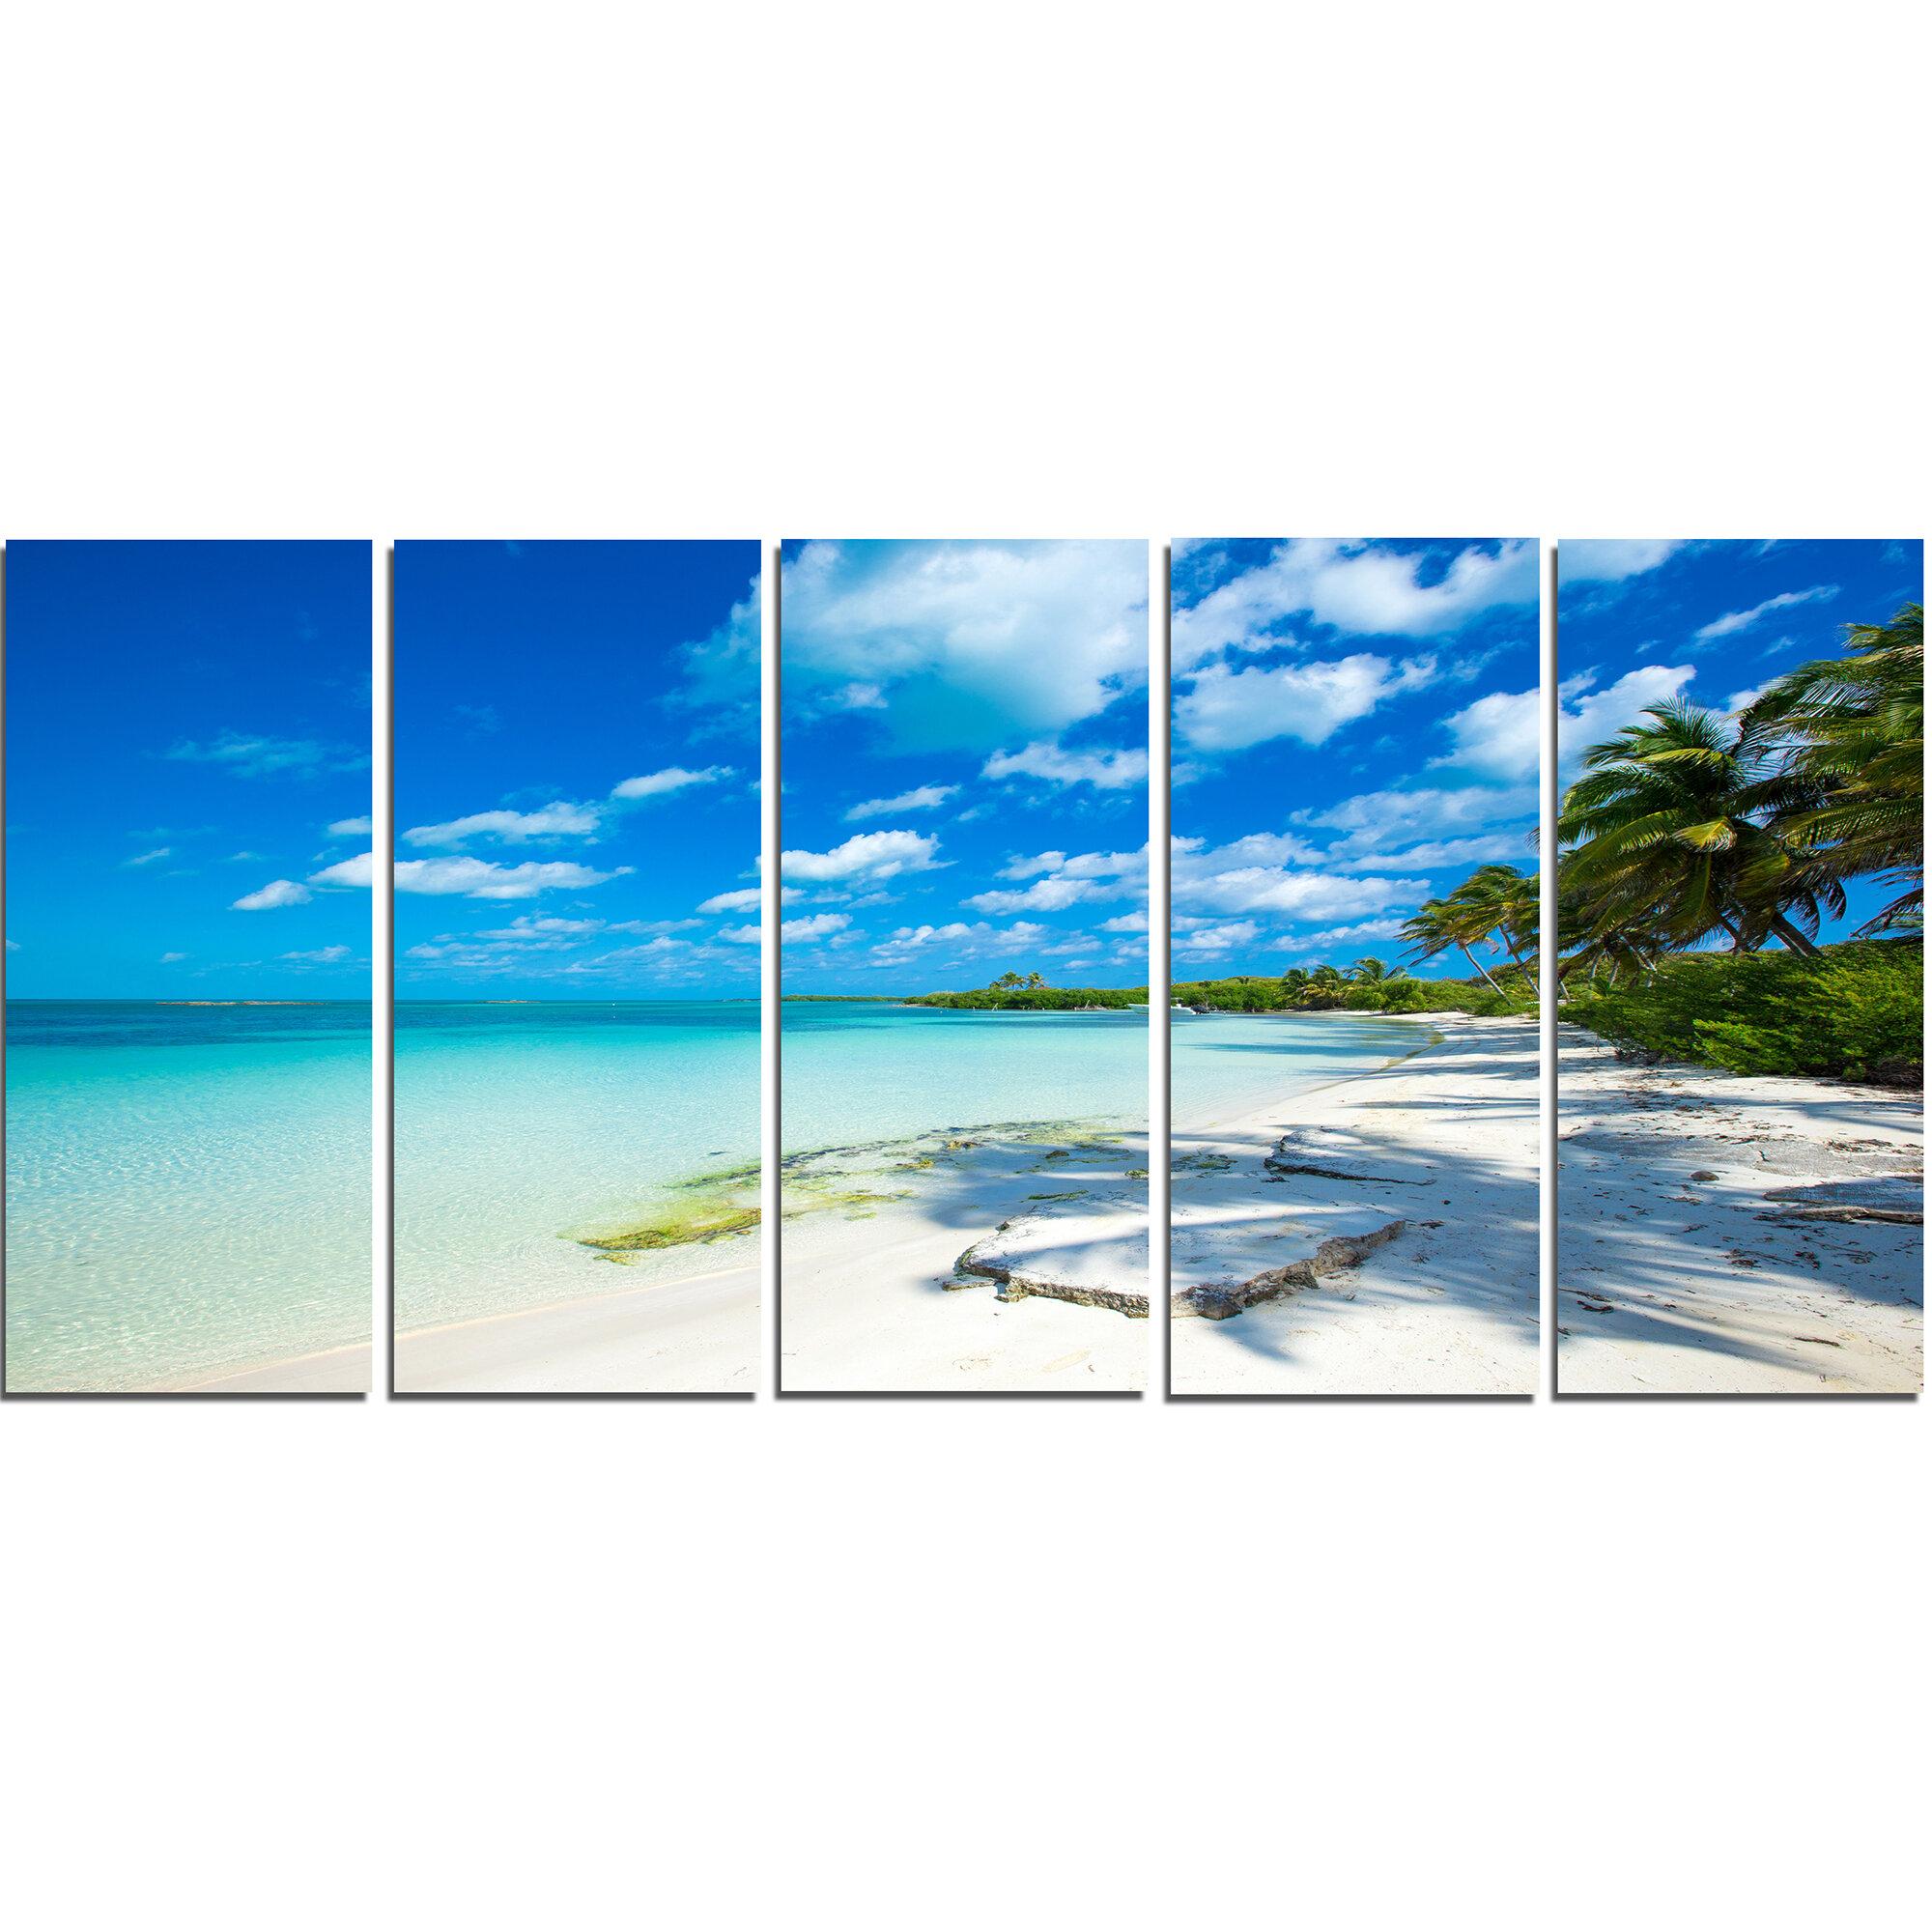 Designart Tropical Beach With Palm Shadows 5 Piece Wall Art On Wrapped Canvas Set Reviews Wayfair